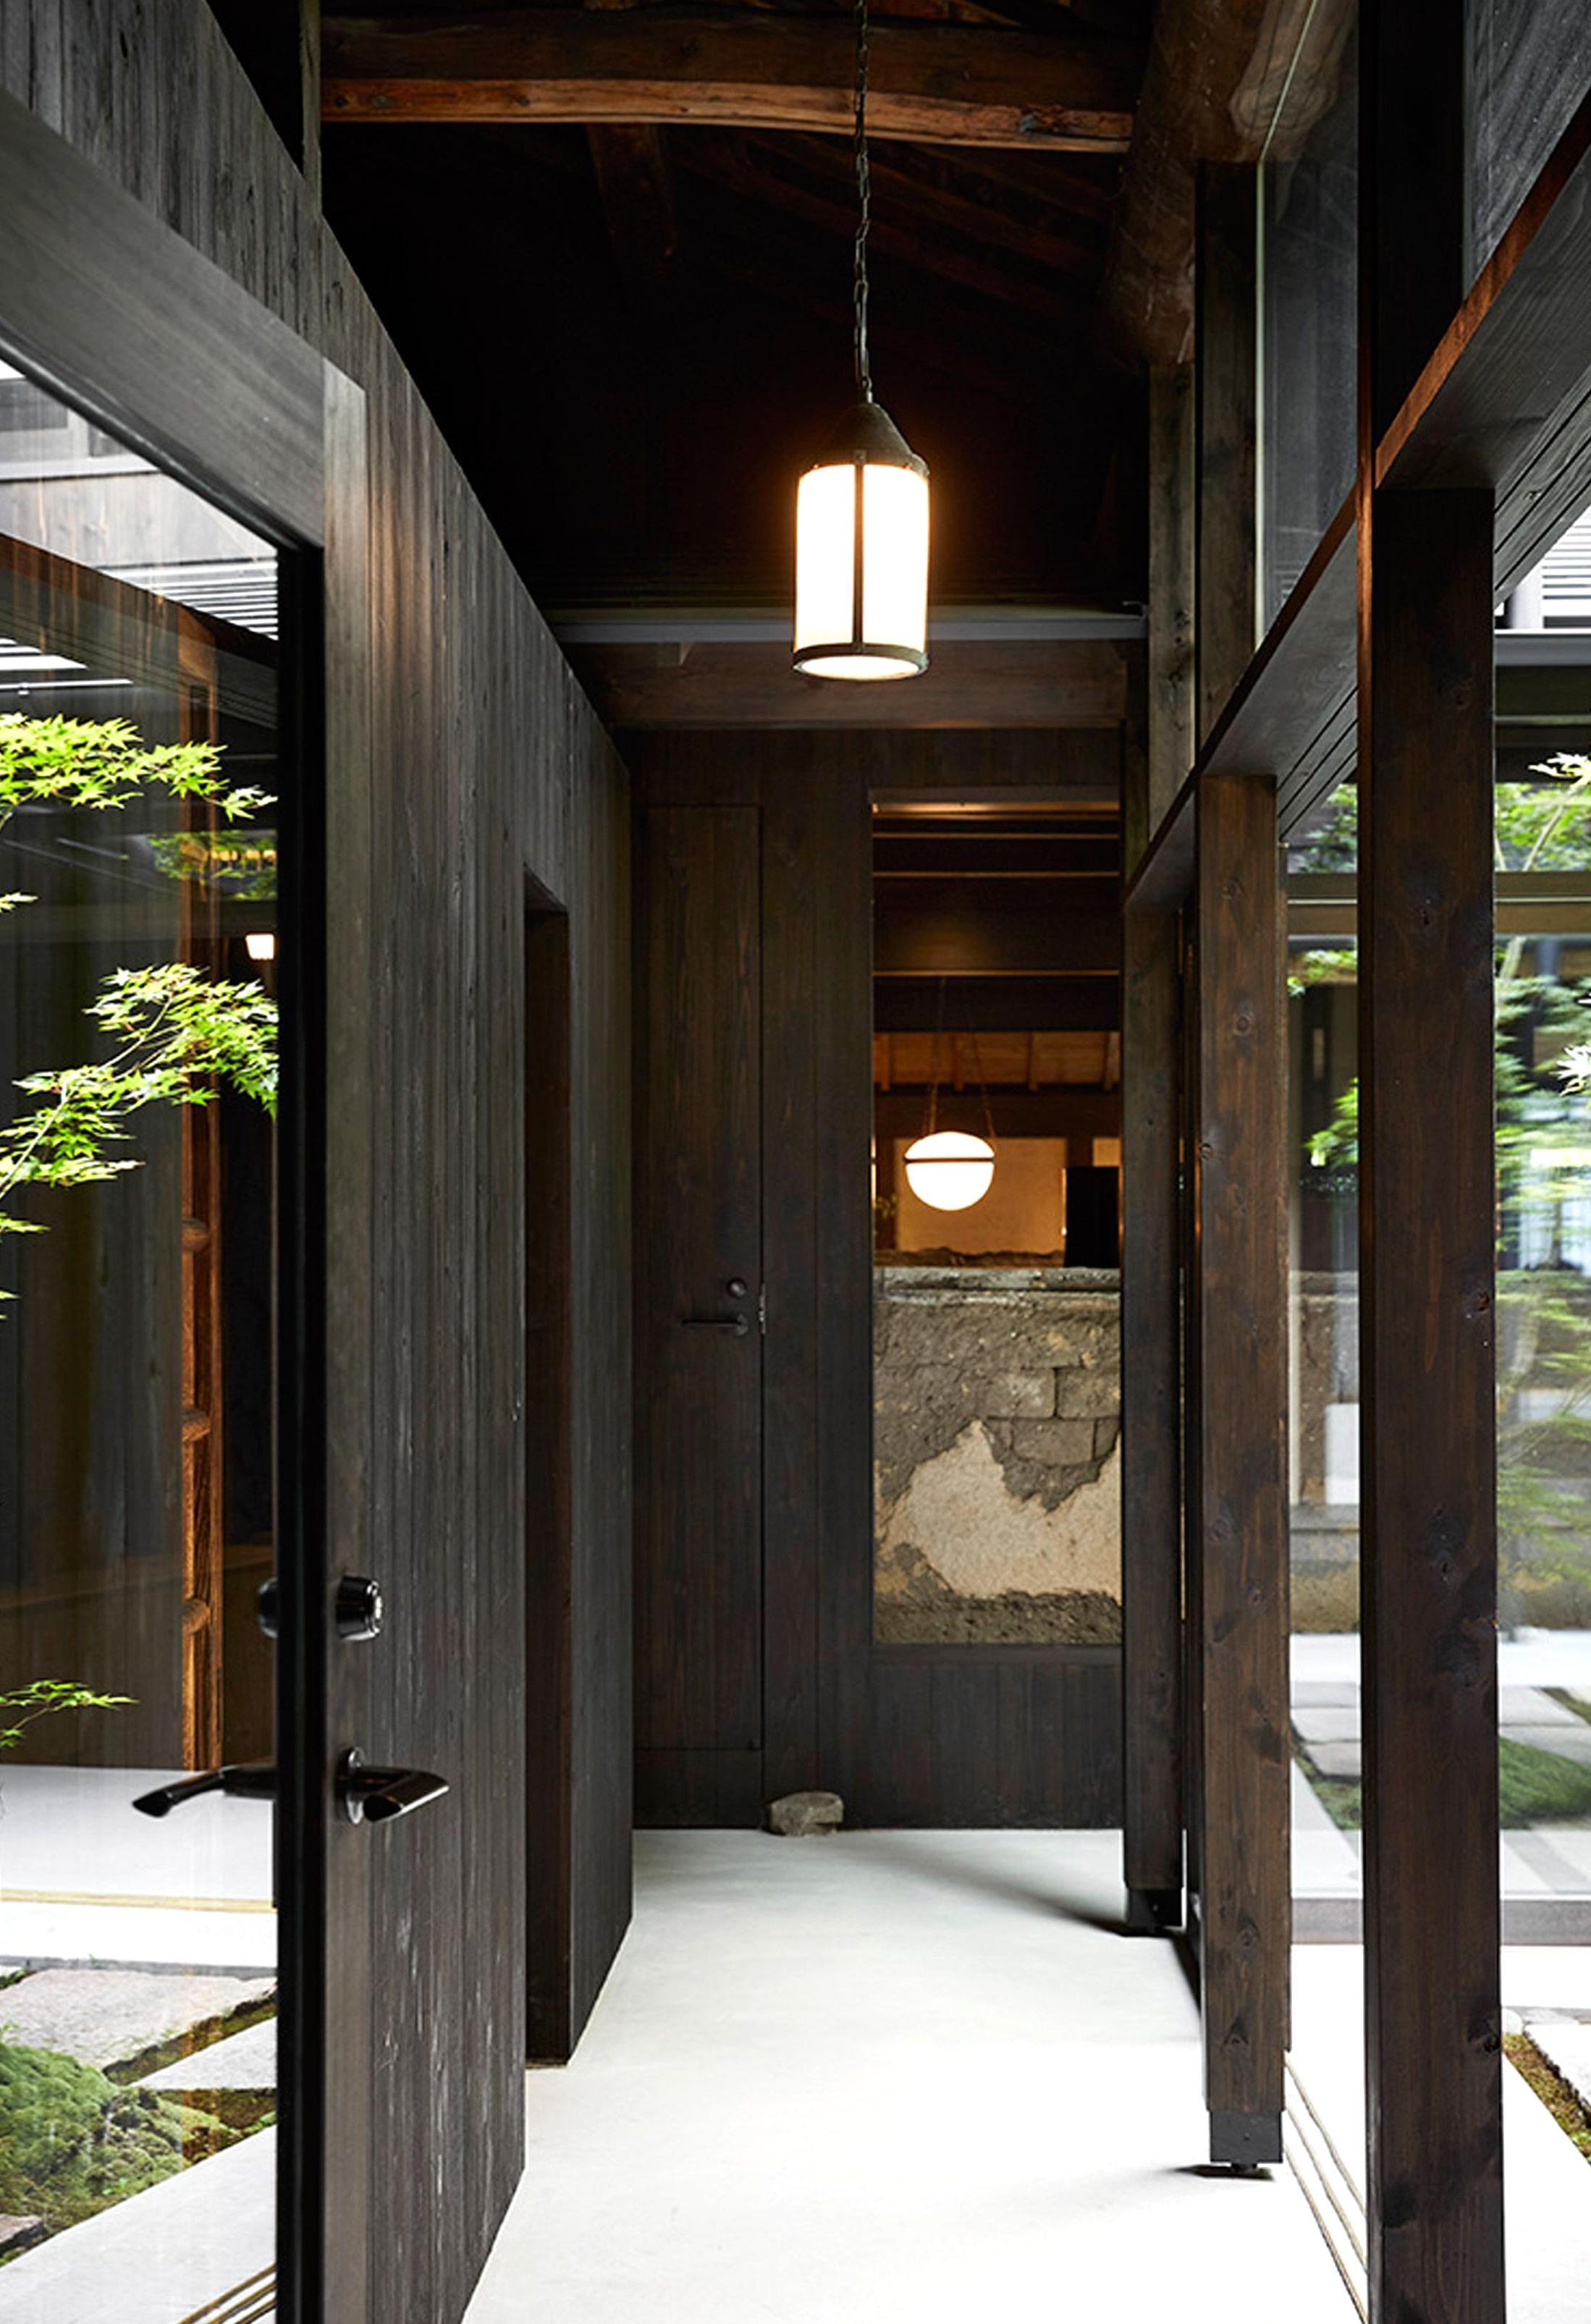 Maoyashi Machiya Kyoto House Uoya Shigenori Japan Architecture Residentialdezeen2364col19 Japanese Interior Design Asian Home Decor Japanese Interior